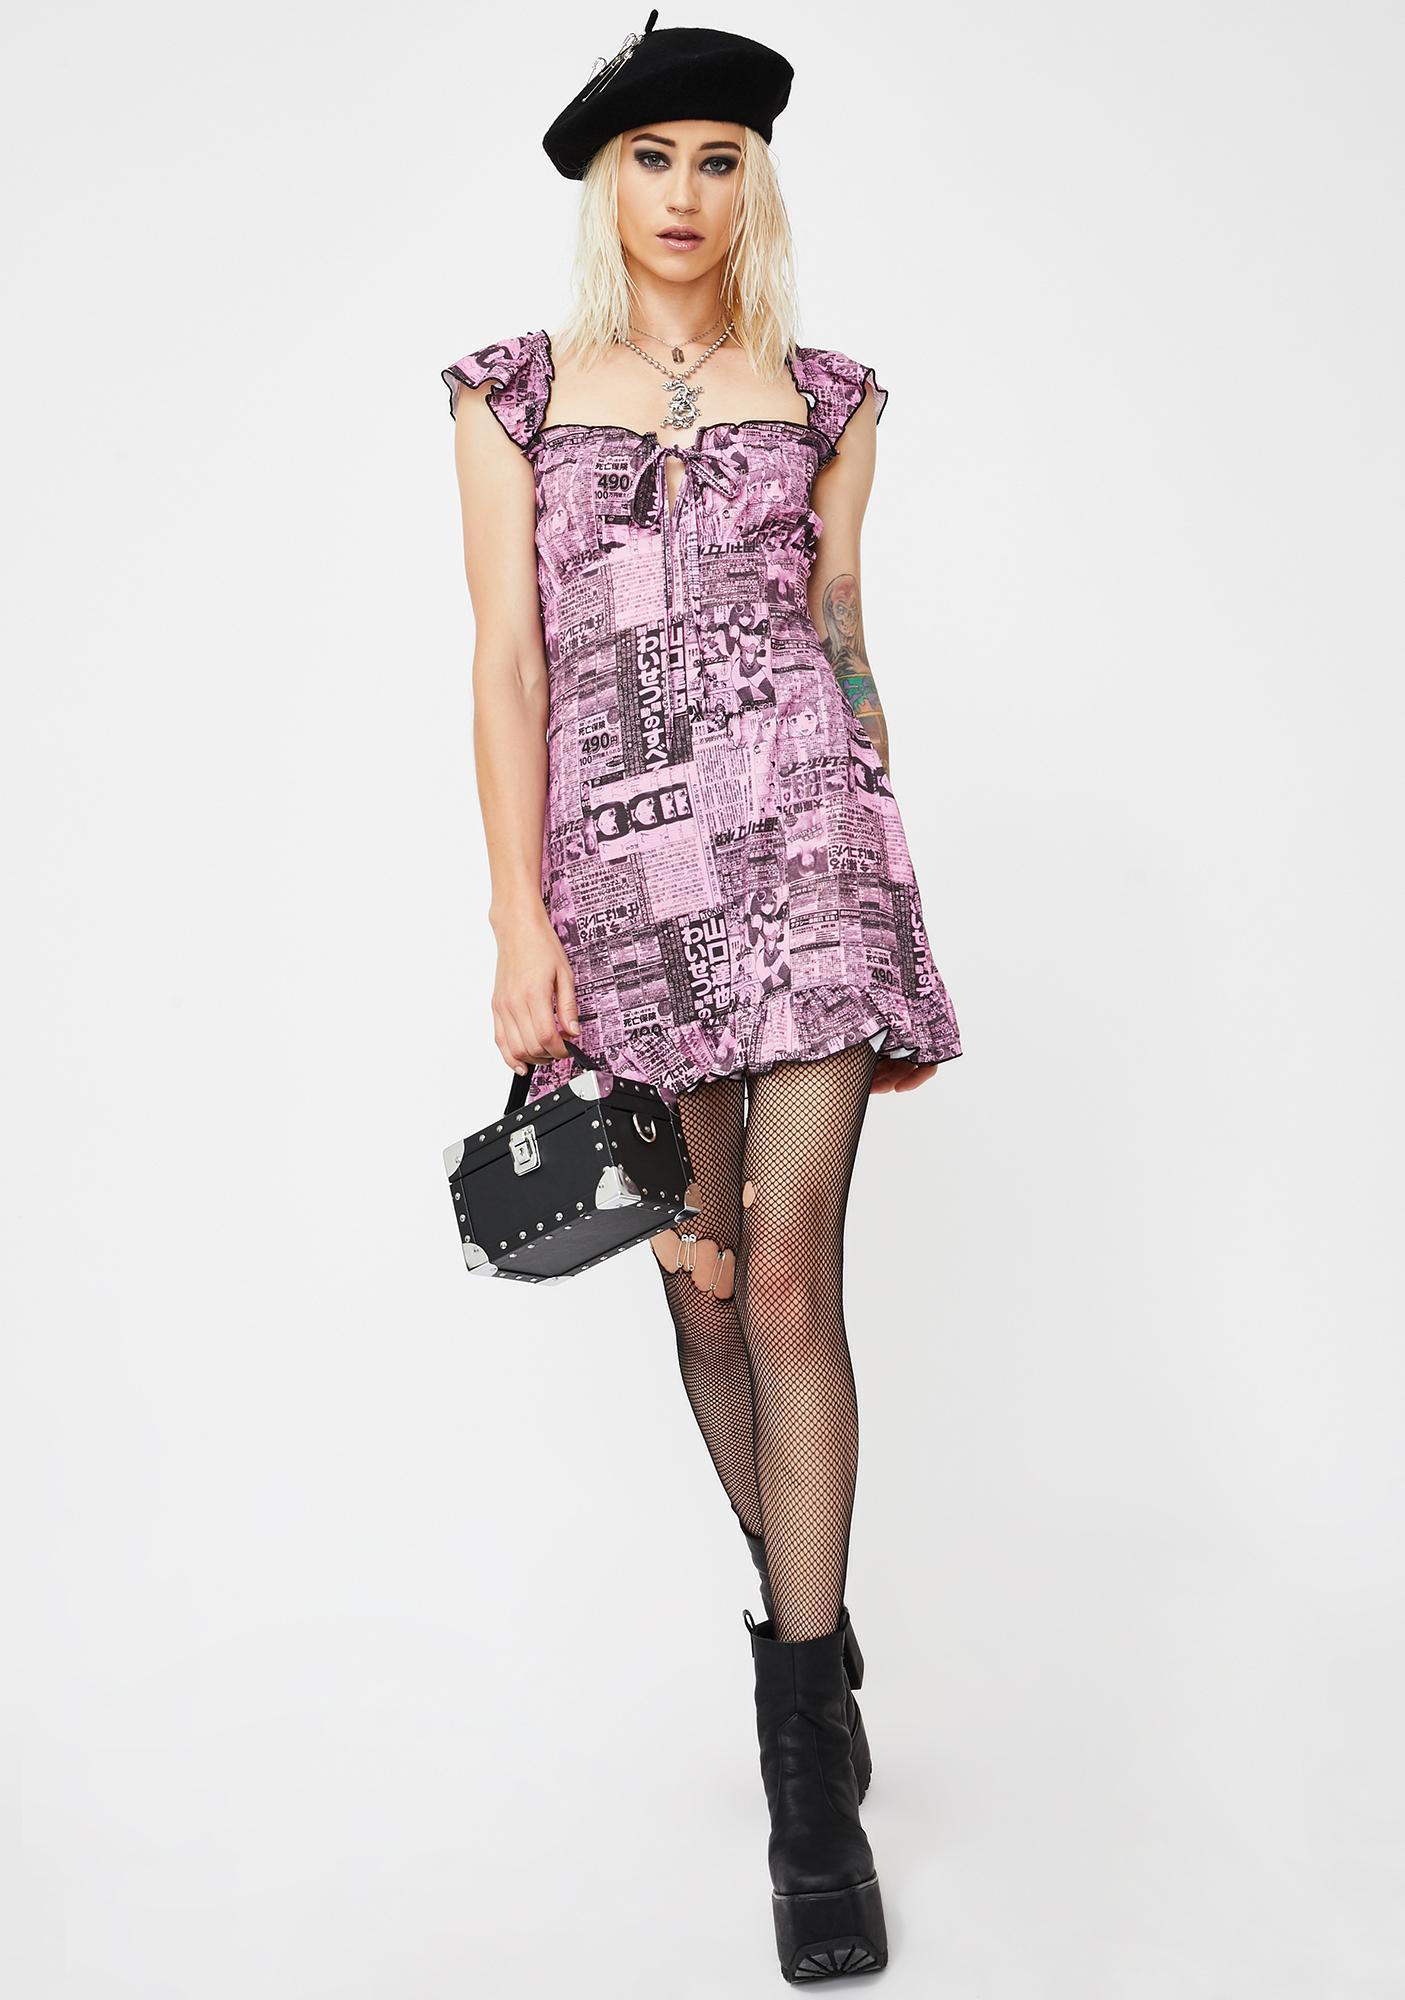 NEW GIRL ORDER Newspaper Print Mini Dress